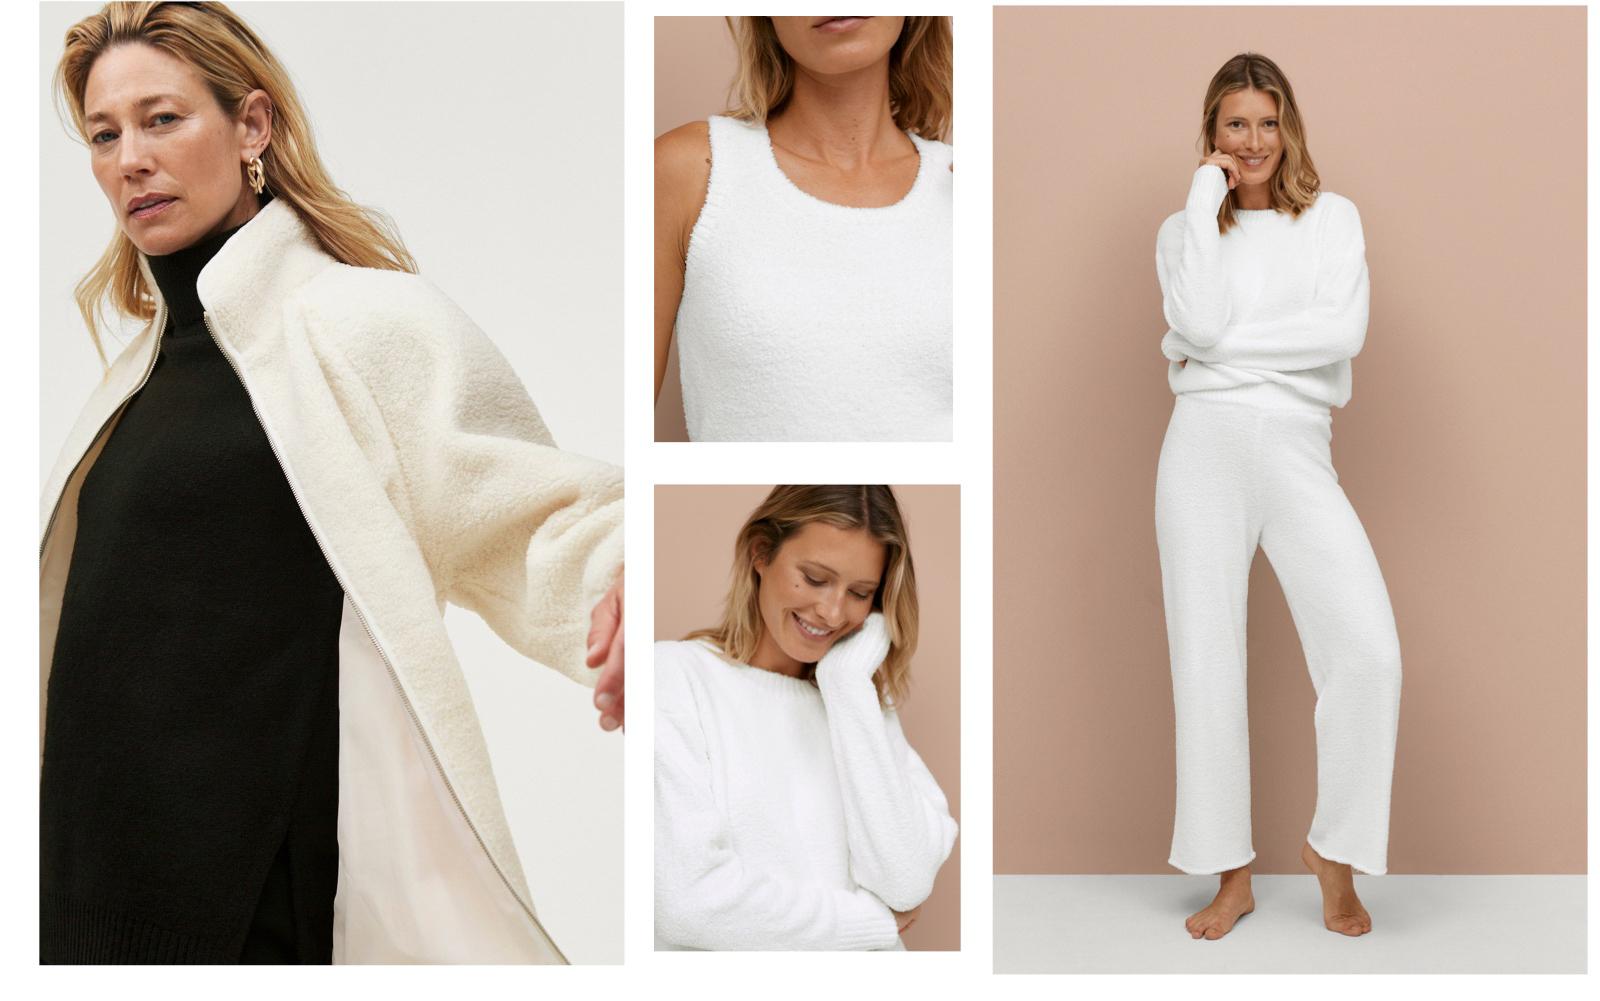 vaaleat vaatteet-2